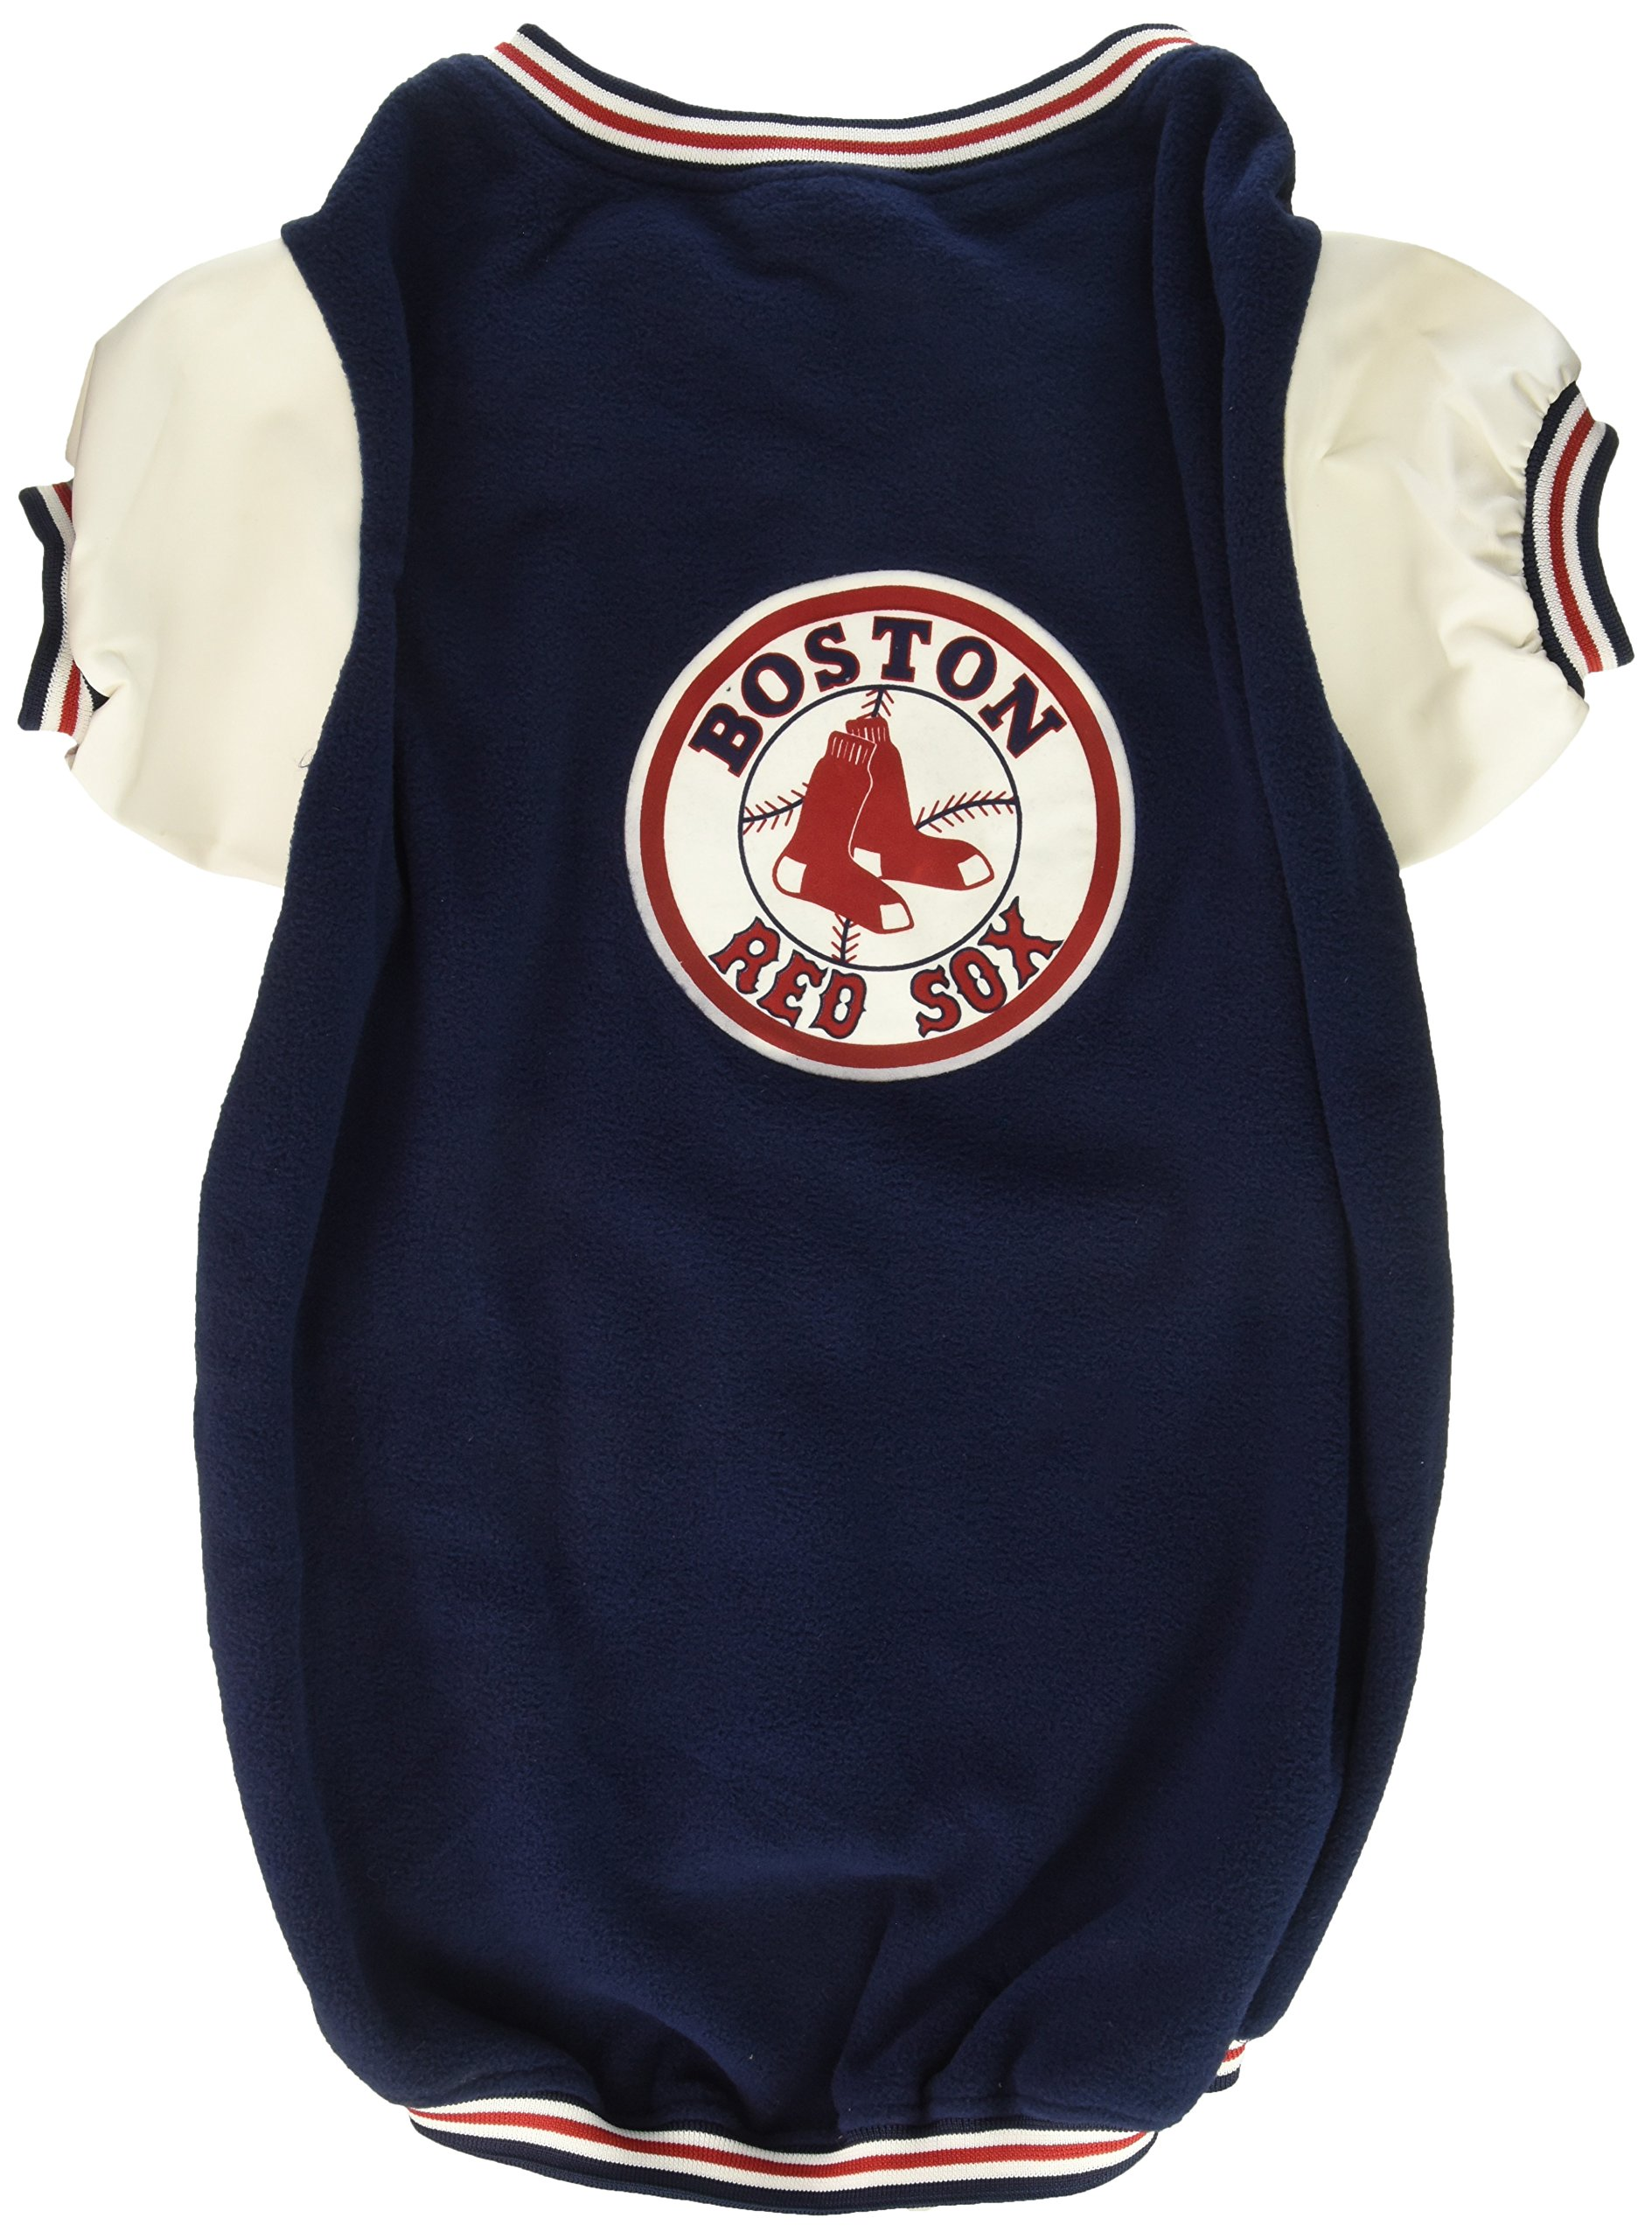 Sporty K9 Boston Red Sox Varsity Dog Jacket, X-Large